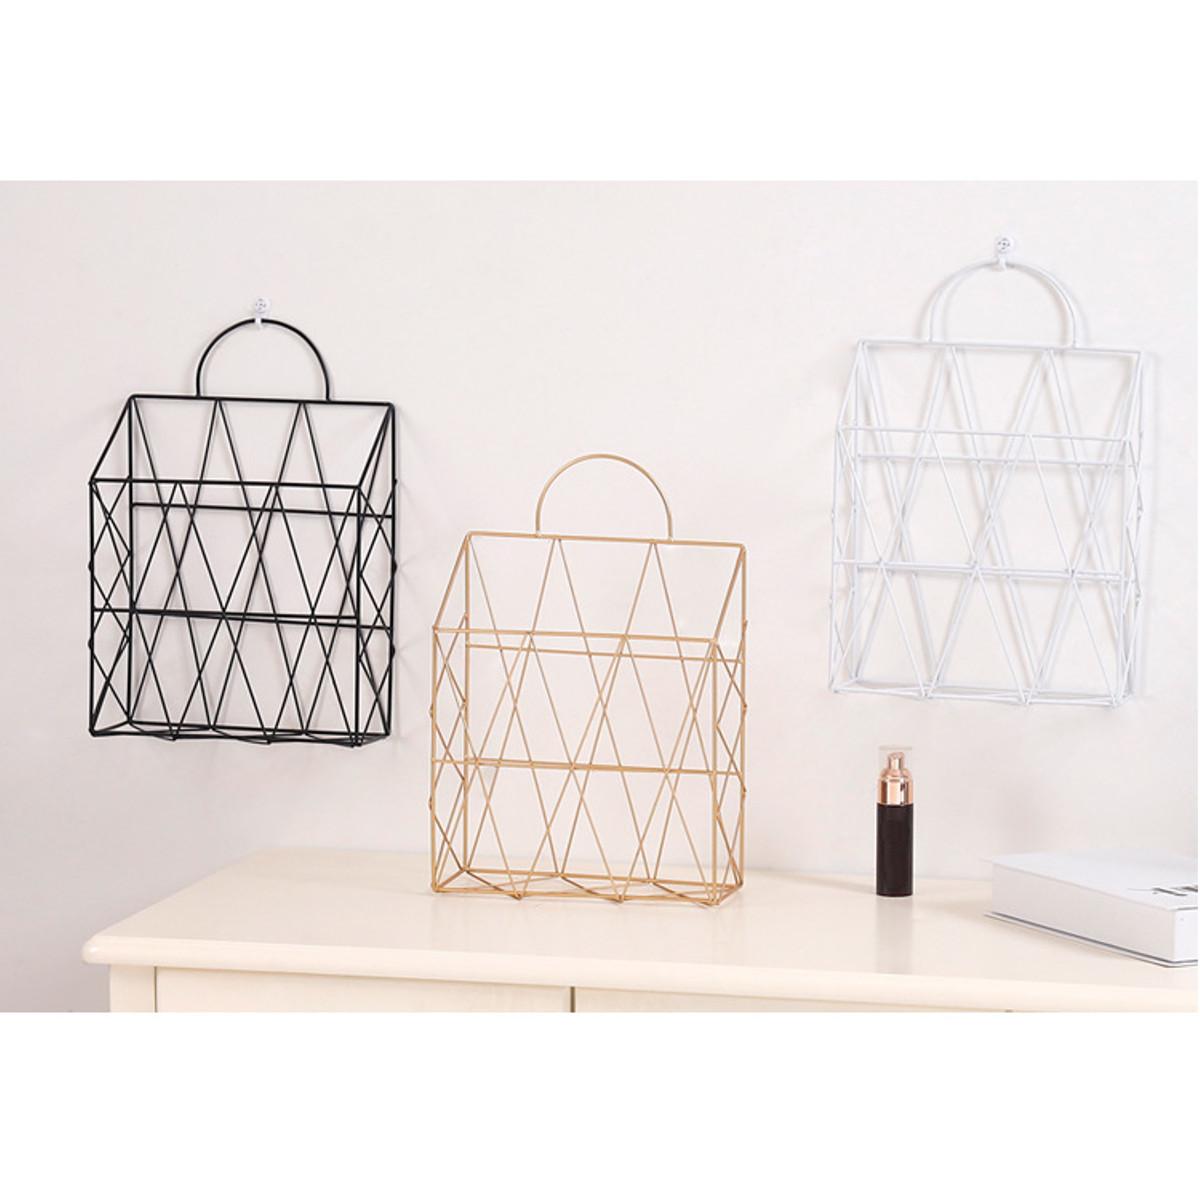 Modern Metal Wire Wall Hanging Shelf Baskets Rack Newspaper Book Storage Display Unit Organizer